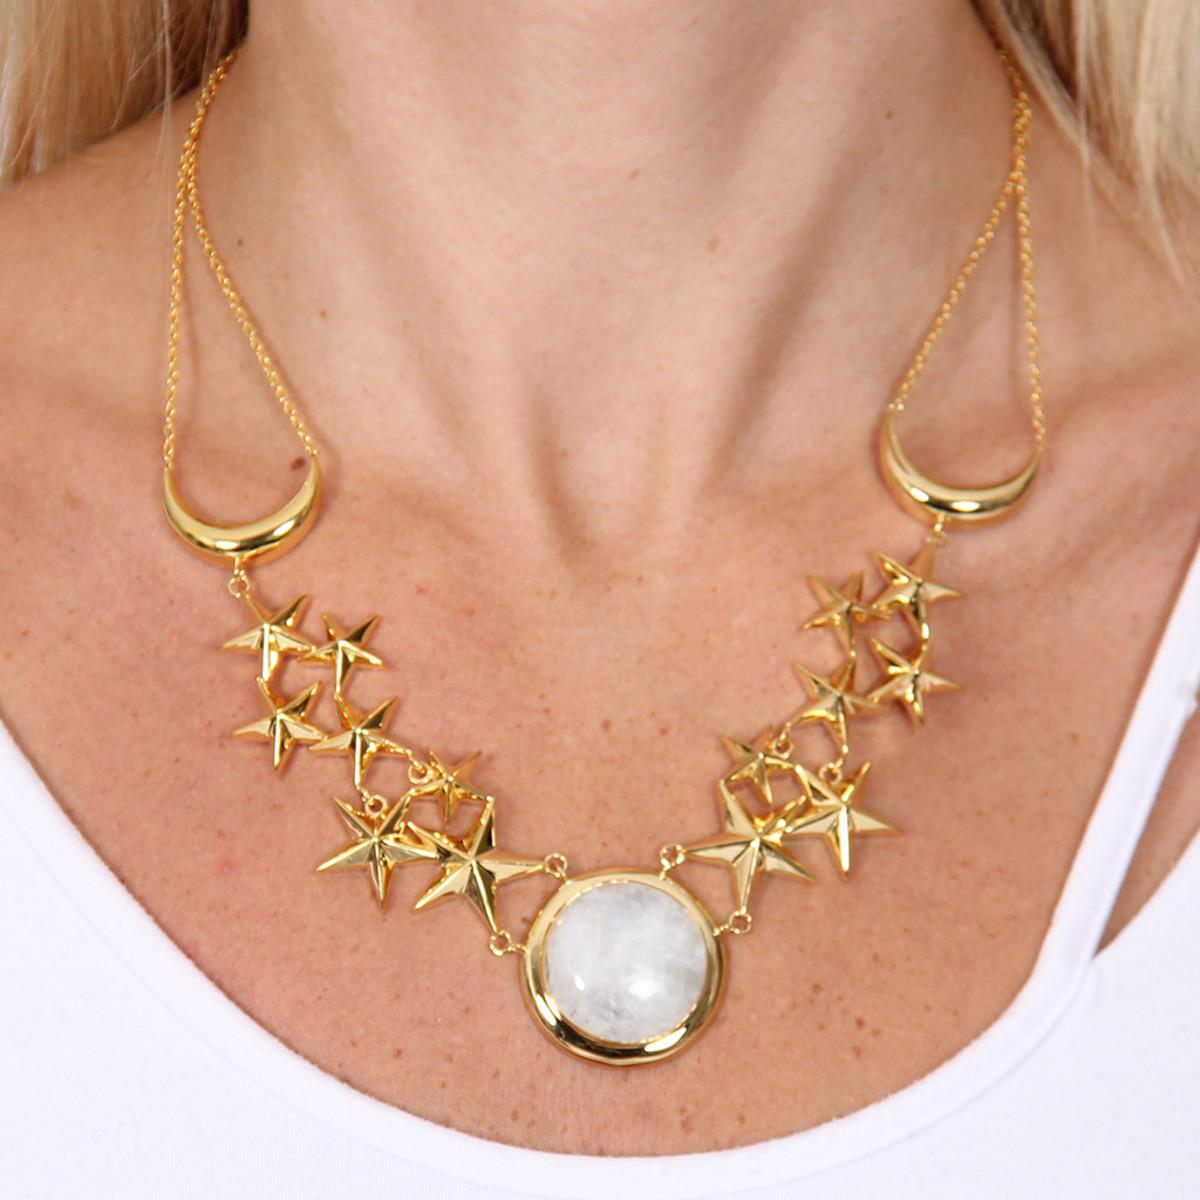 JEWELLERY - Necklaces Pamela Love mFbbl